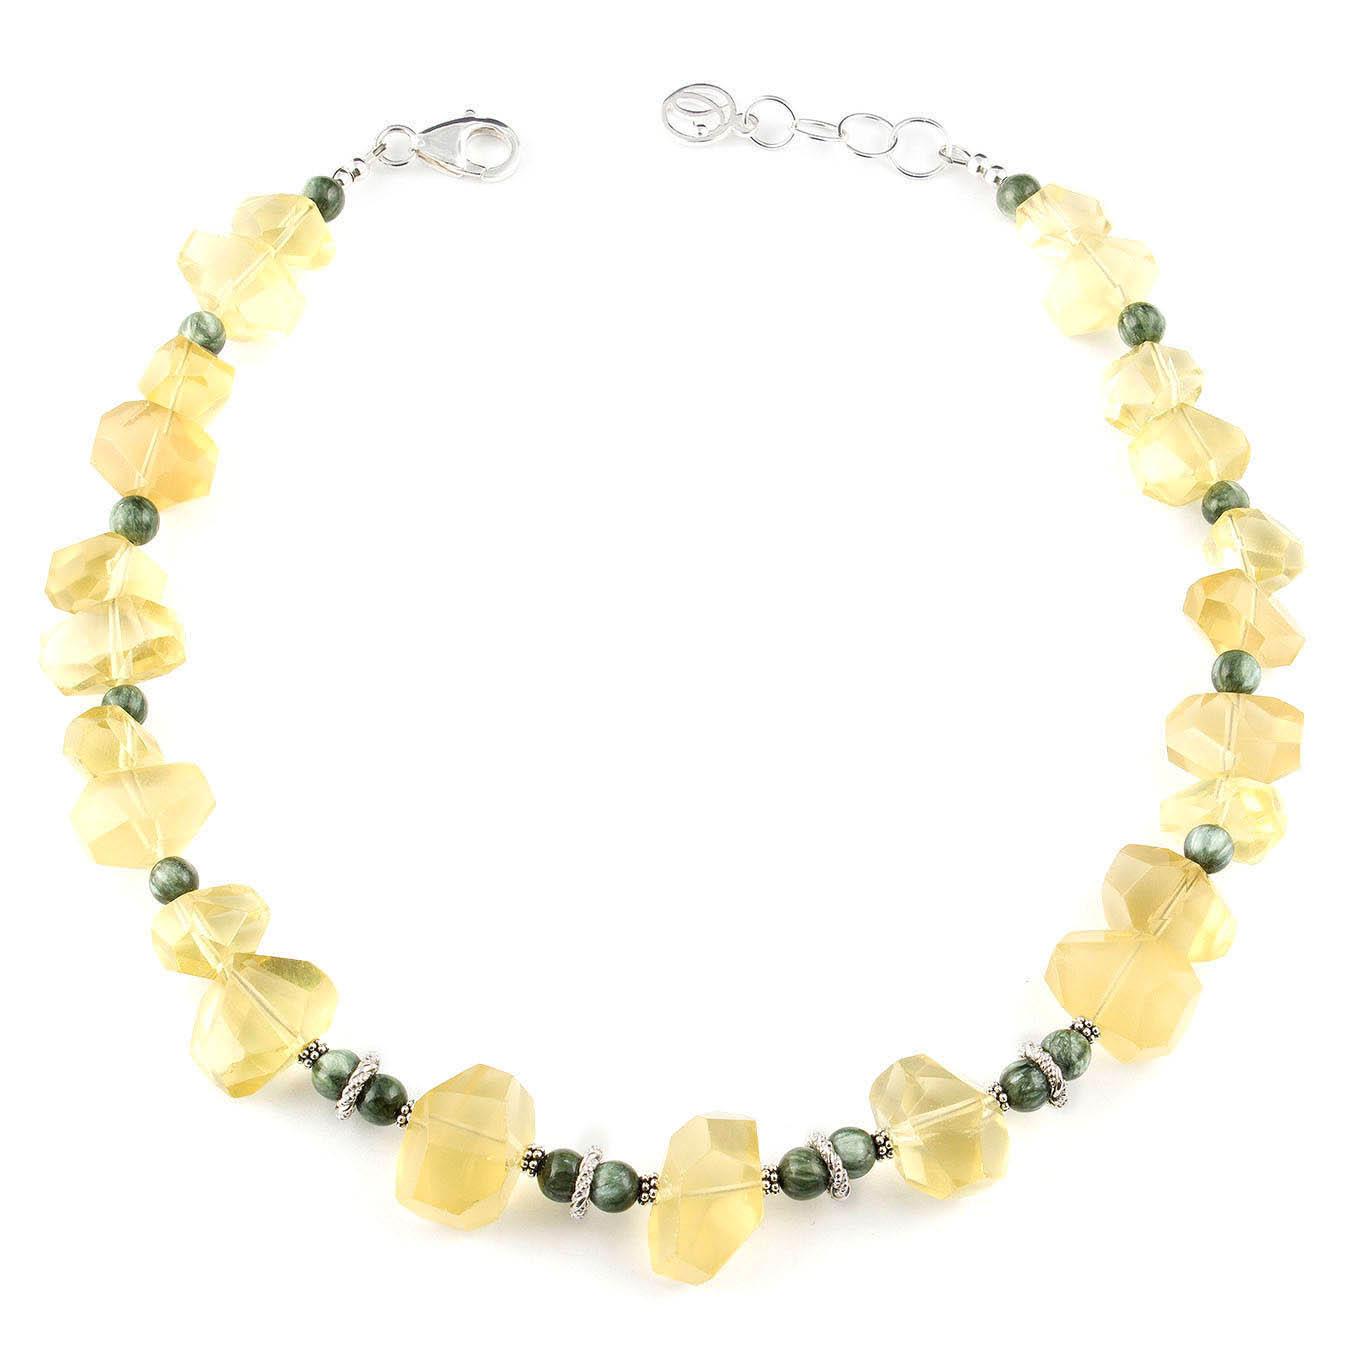 Statement bead jewelry made with natural lemon quartz and seraphinite